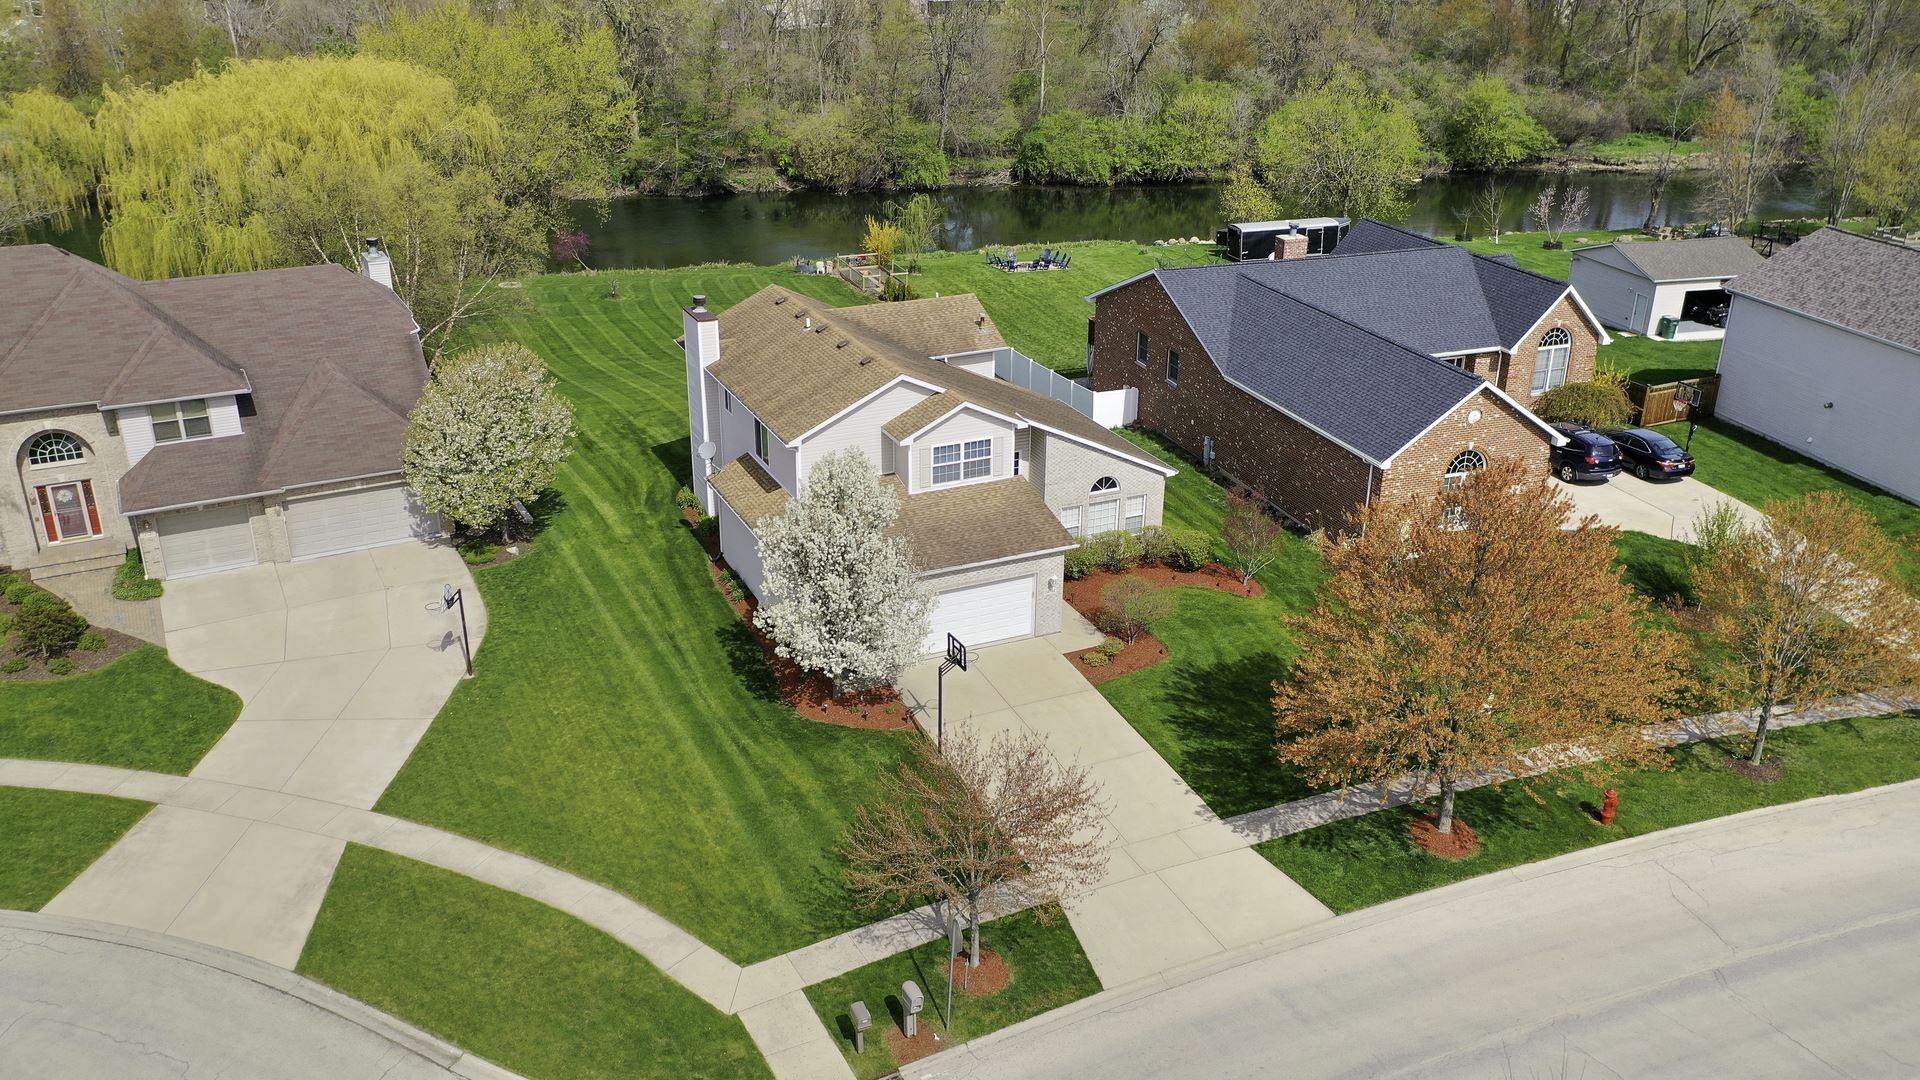 Photo of 24544 States Lane, Shorewood, IL 60404 (MLS # 11058272)